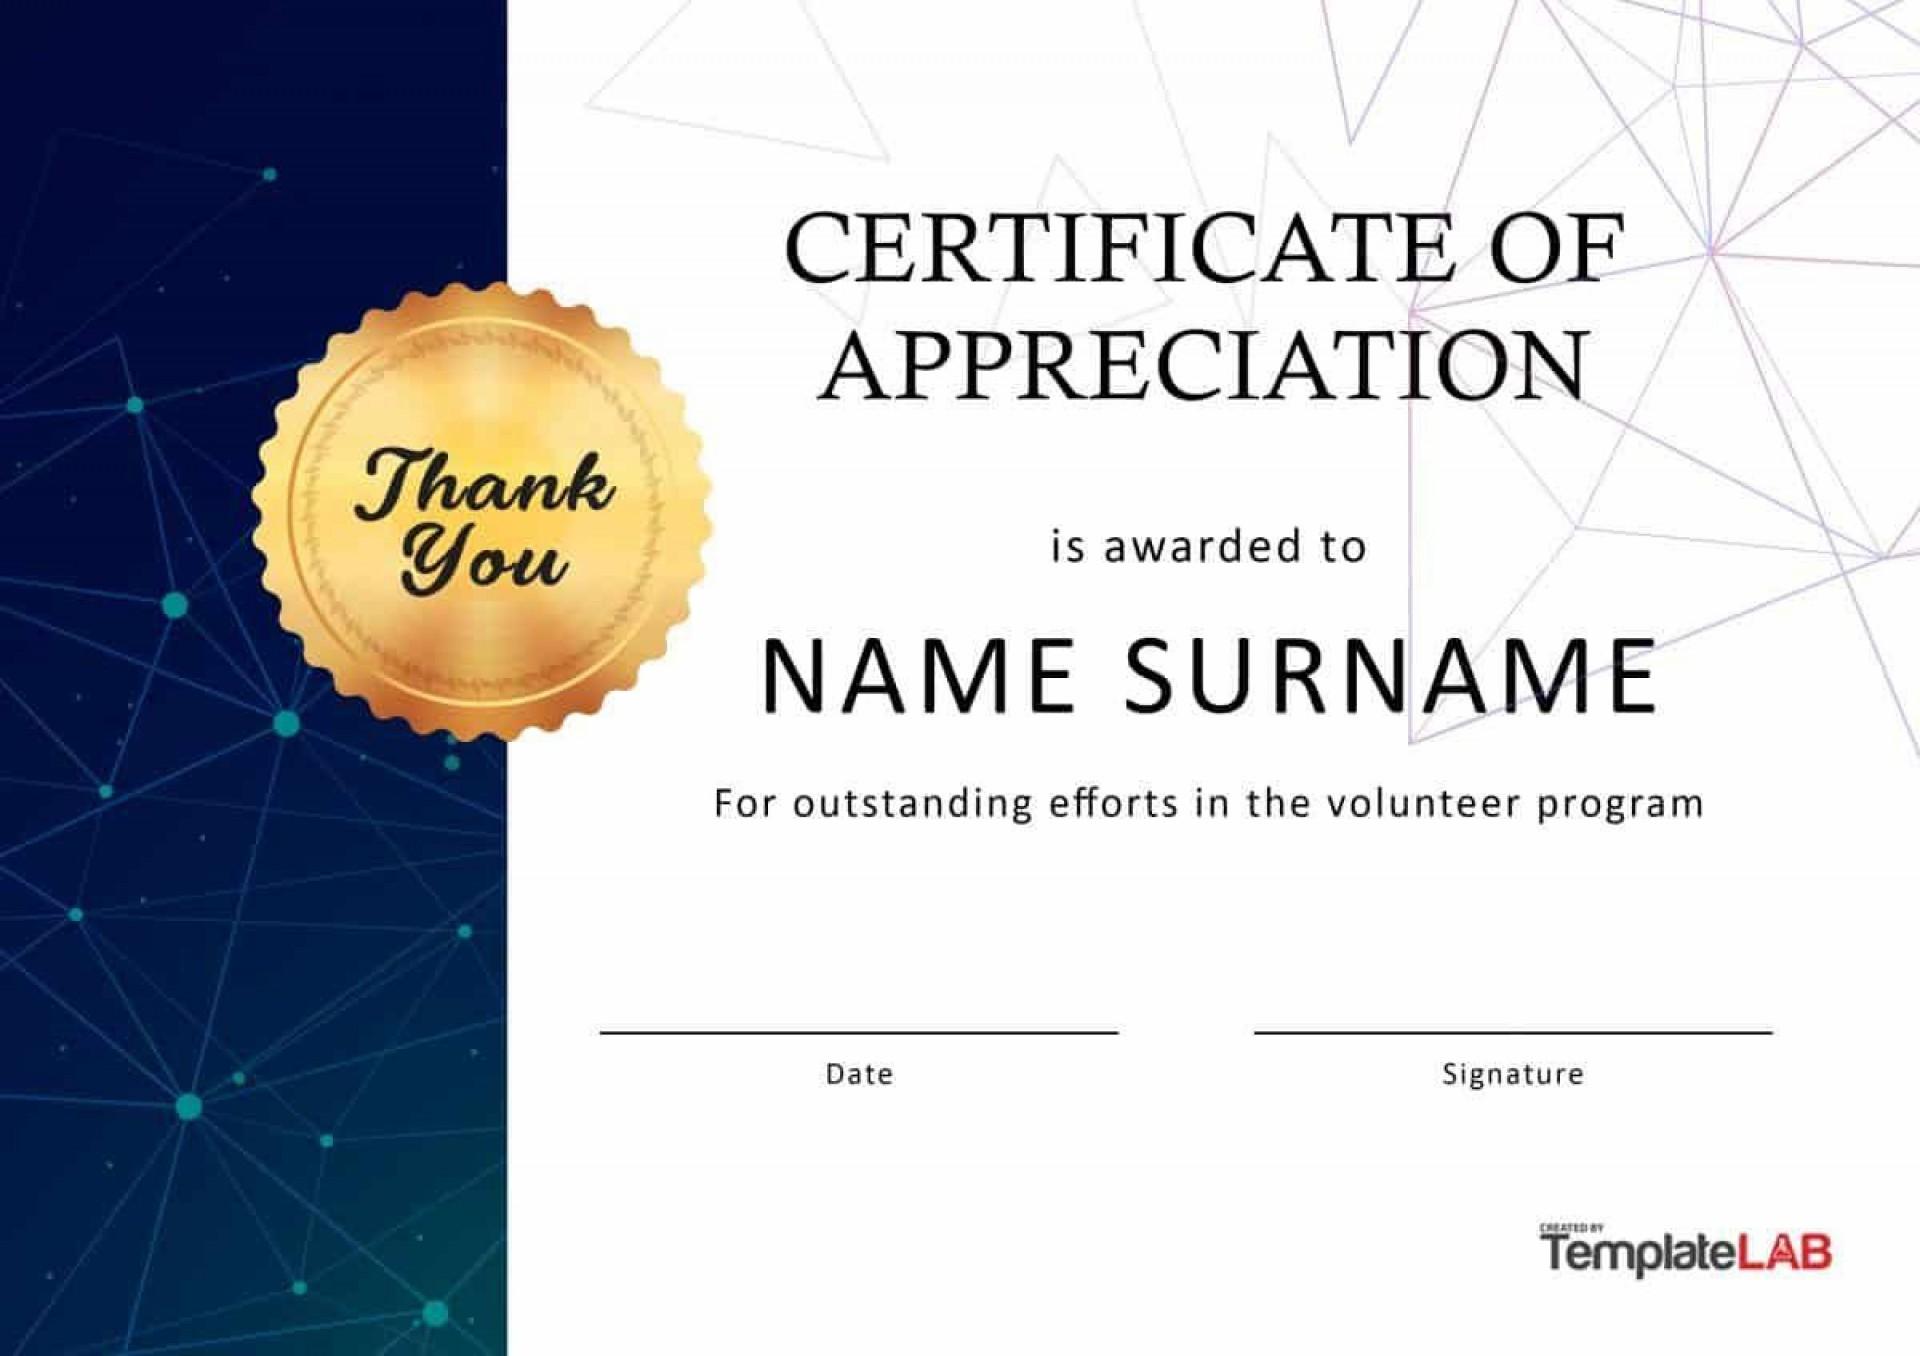 001 Breathtaking Certificate Of Appreciation Template Free Design  Microsoft Word Download Publisher Editable1920